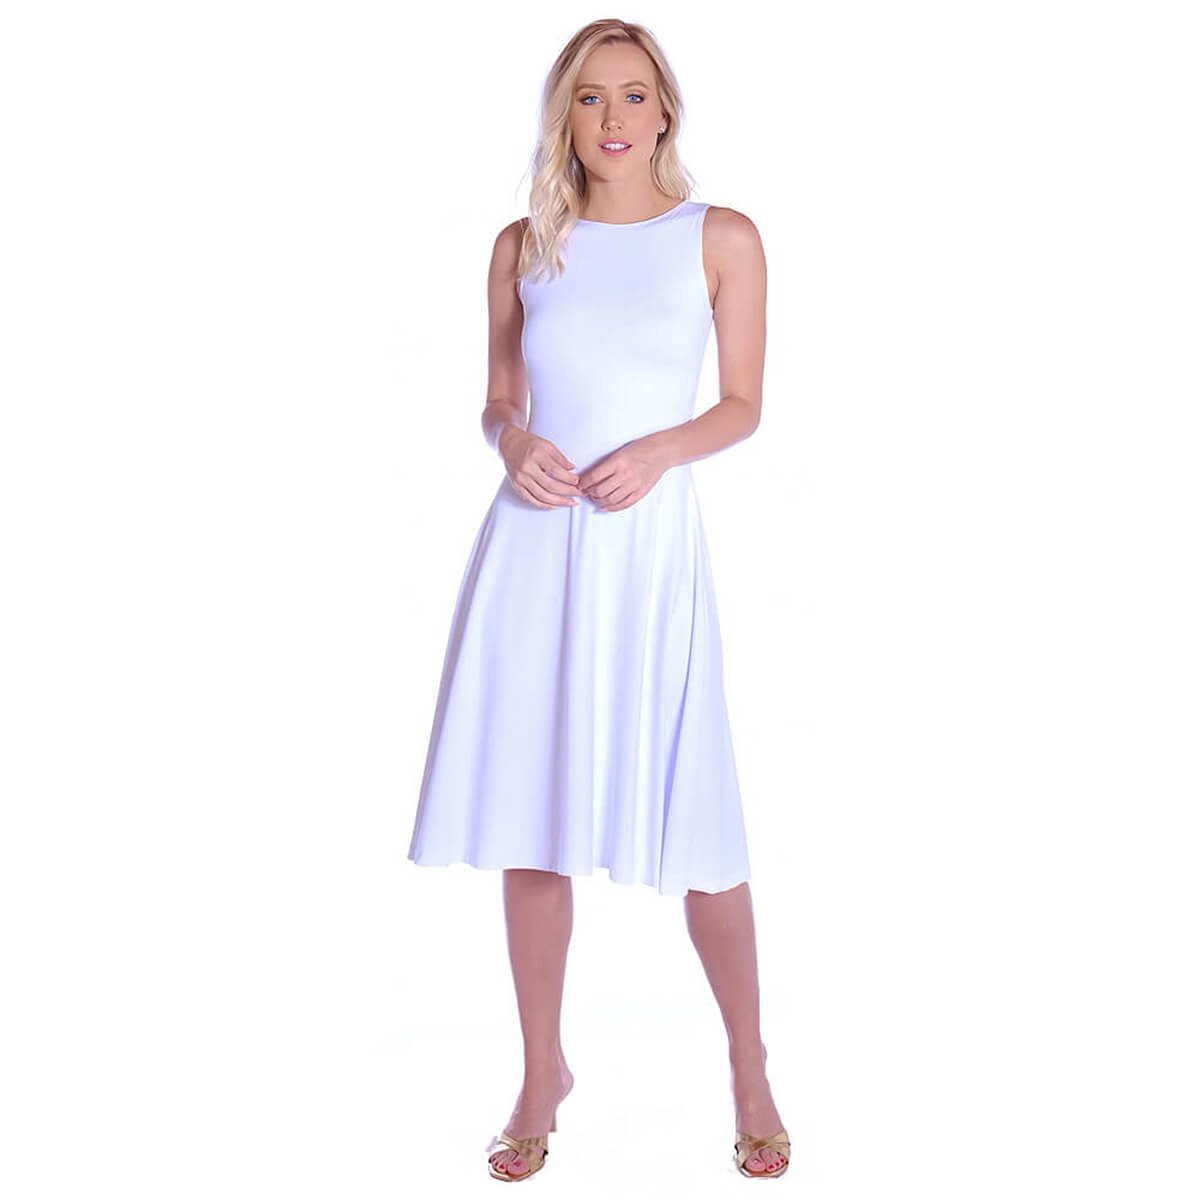 Vestido Branco FICALINDA Regata Decote Canoa